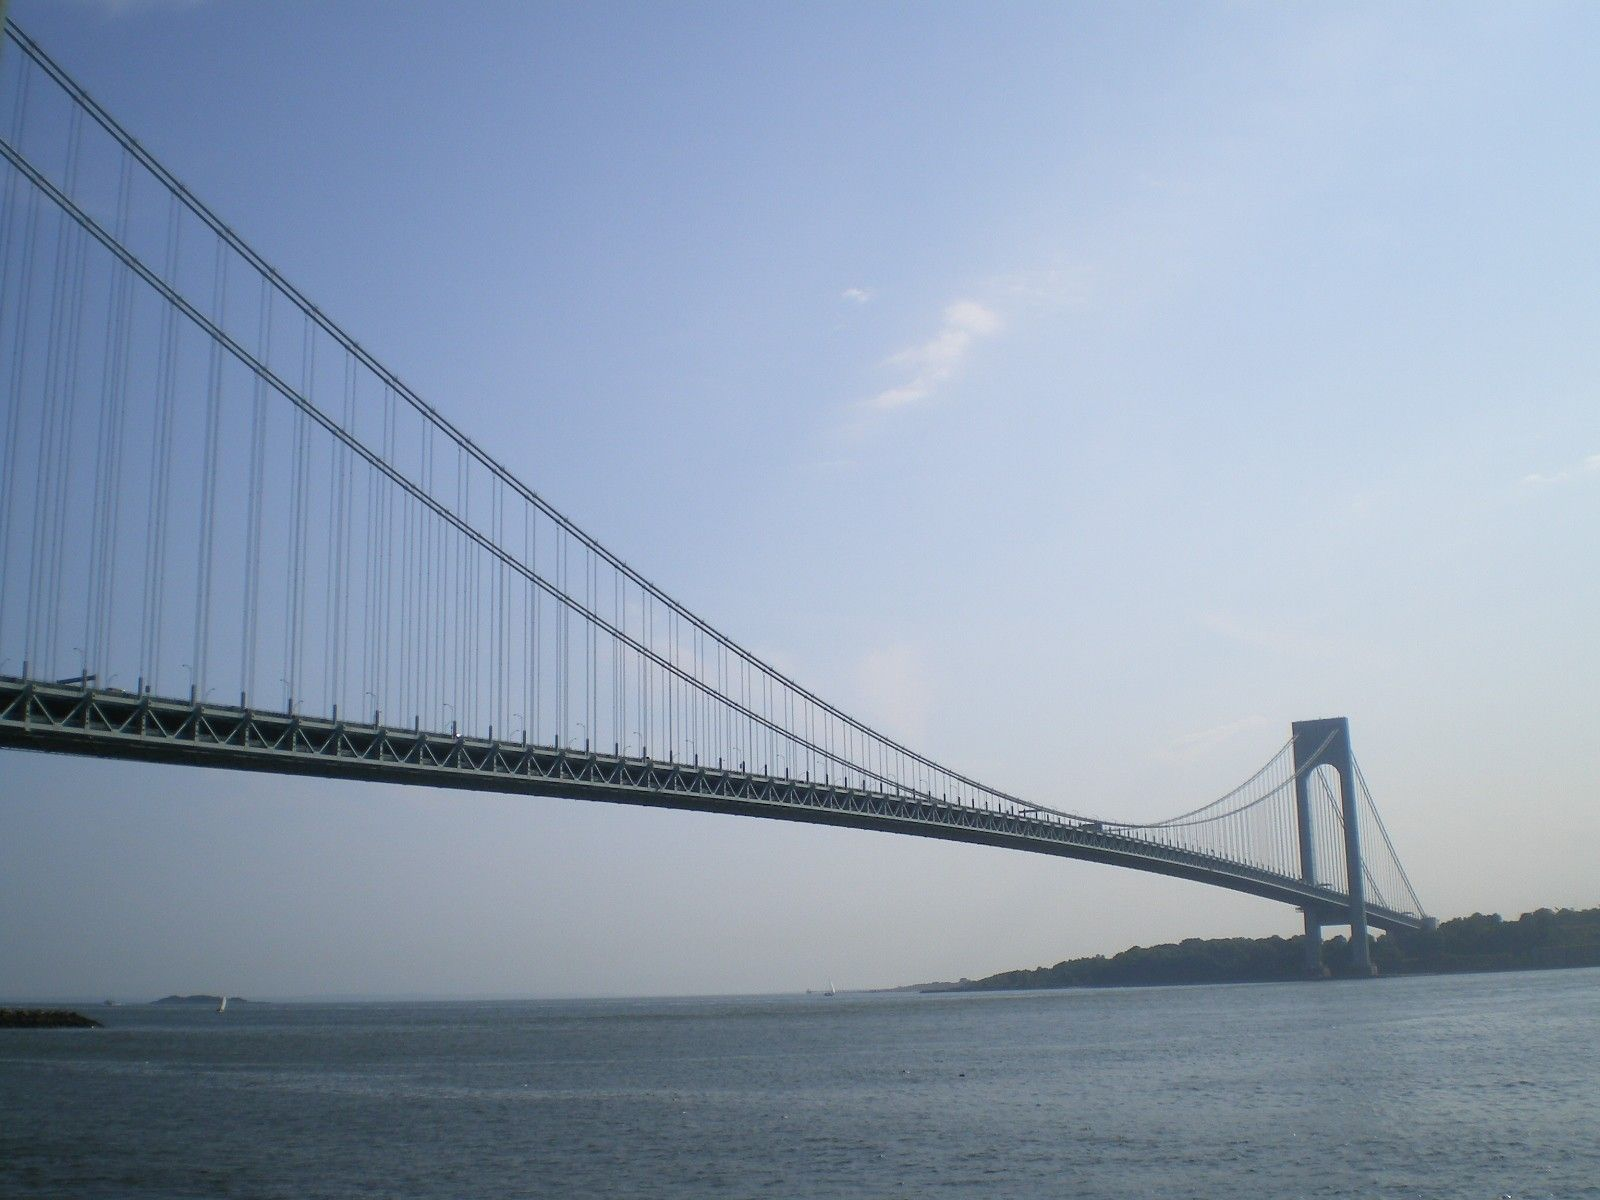 verrazano-narrows bridge, new york rp for youhttp://fernando